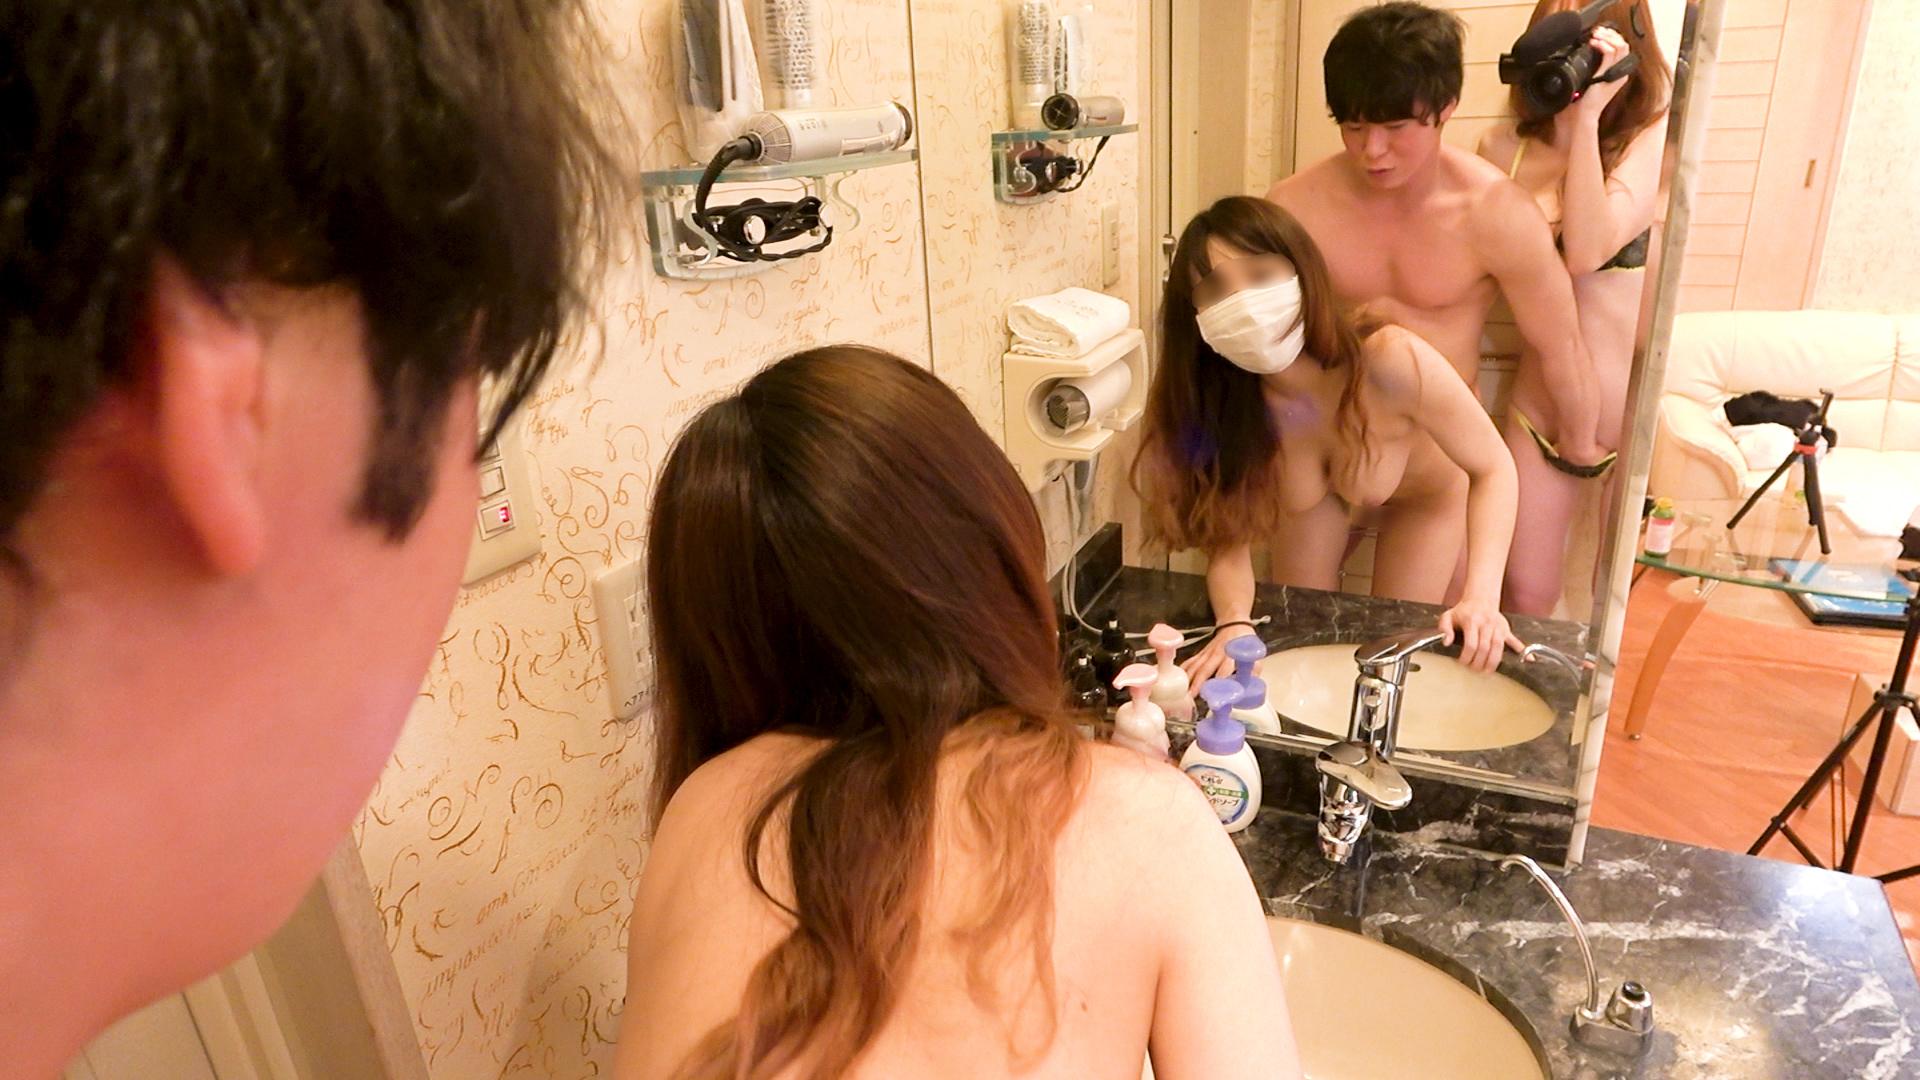 FC2 PPV 1293552 鏡の前で親友が犯されちているのを撮影しちゃいました♥️童貞みたいな男の人だったのにミナちゃんのFカップに大興奮で豹変してすごく。えろかった思い出♥️№33♥️